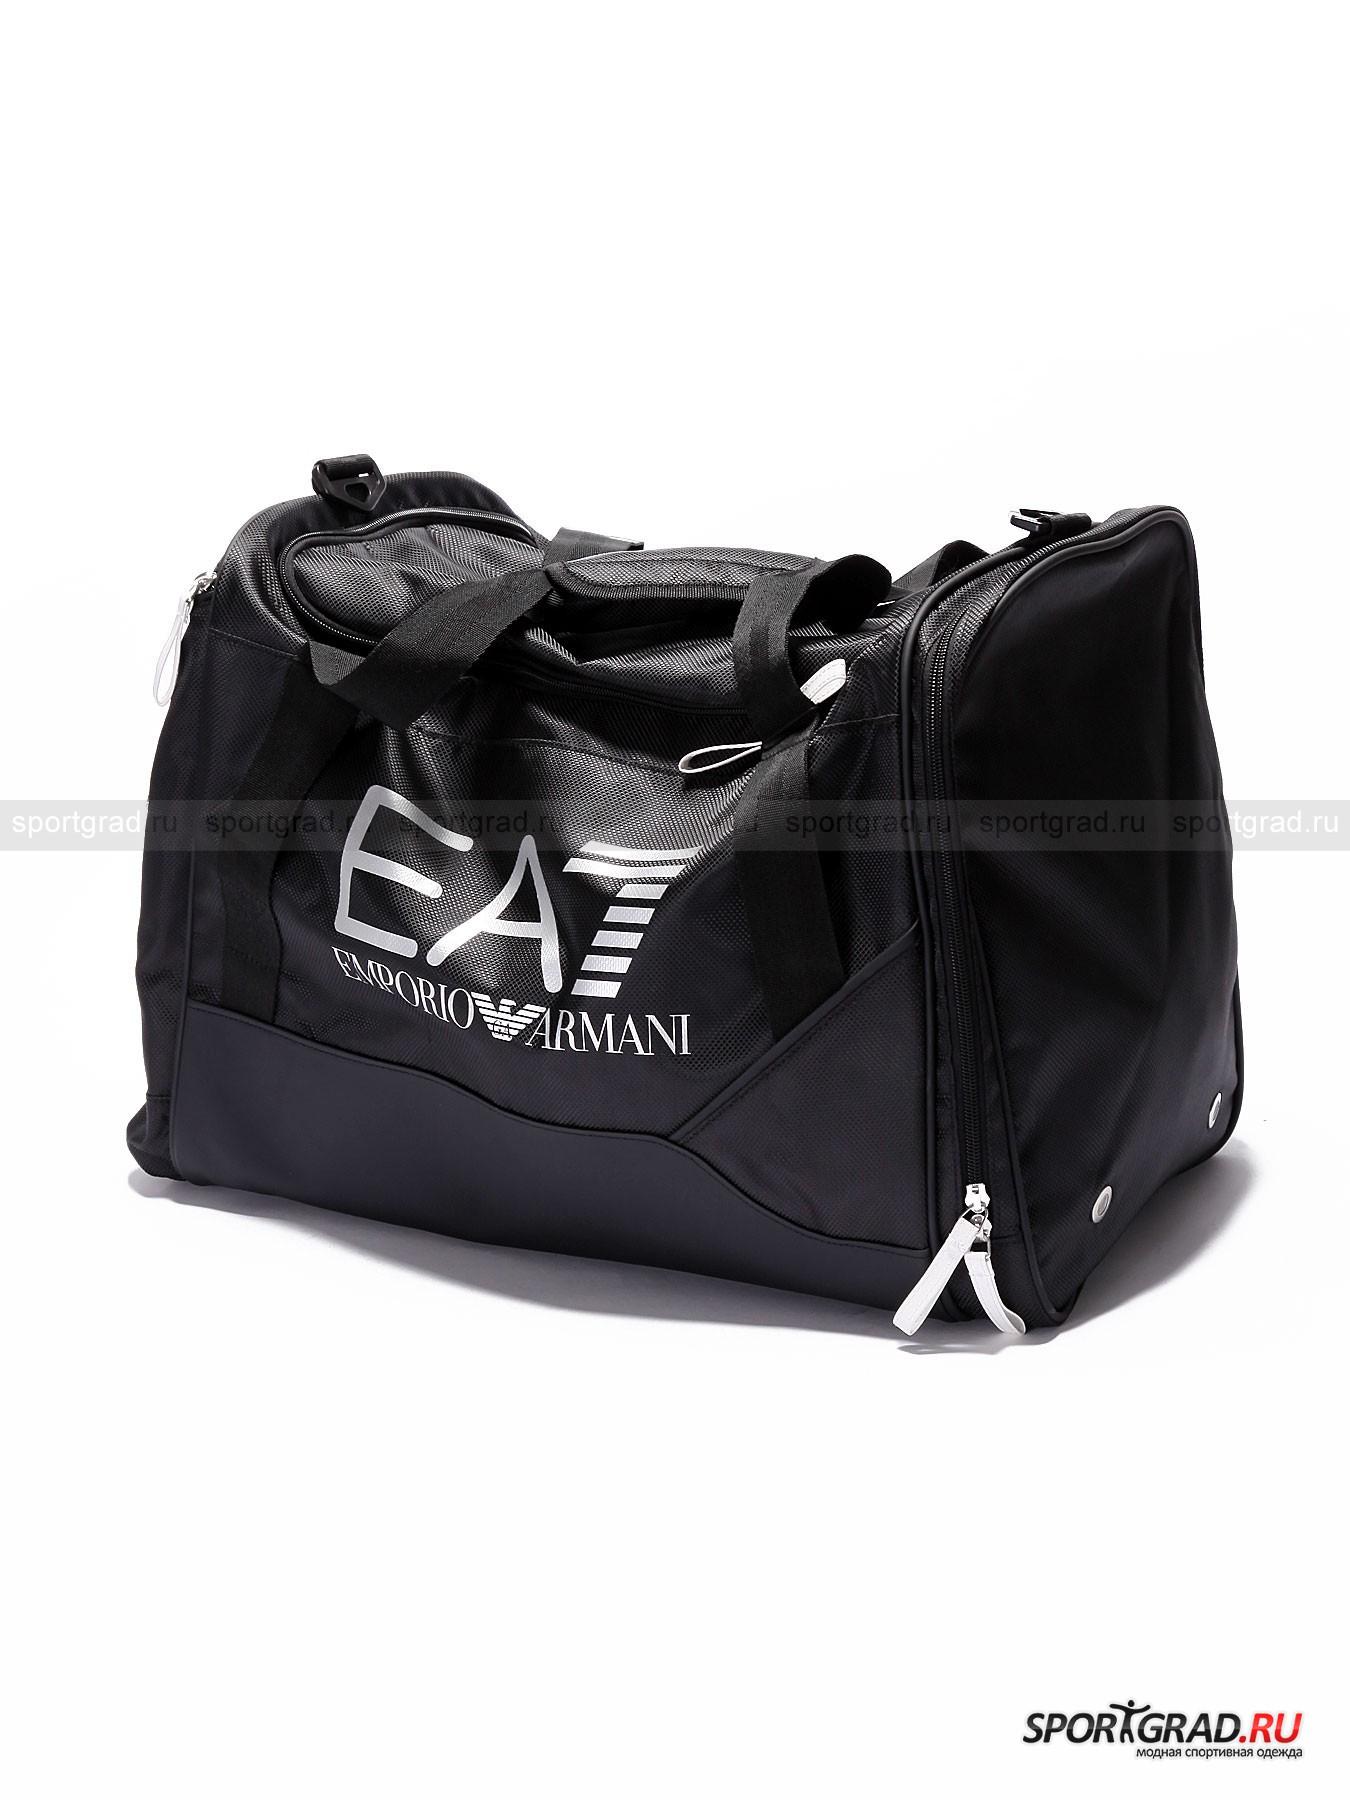 Сумка Visibility M Gym Bag EMPORIO ARMANI от Спортград